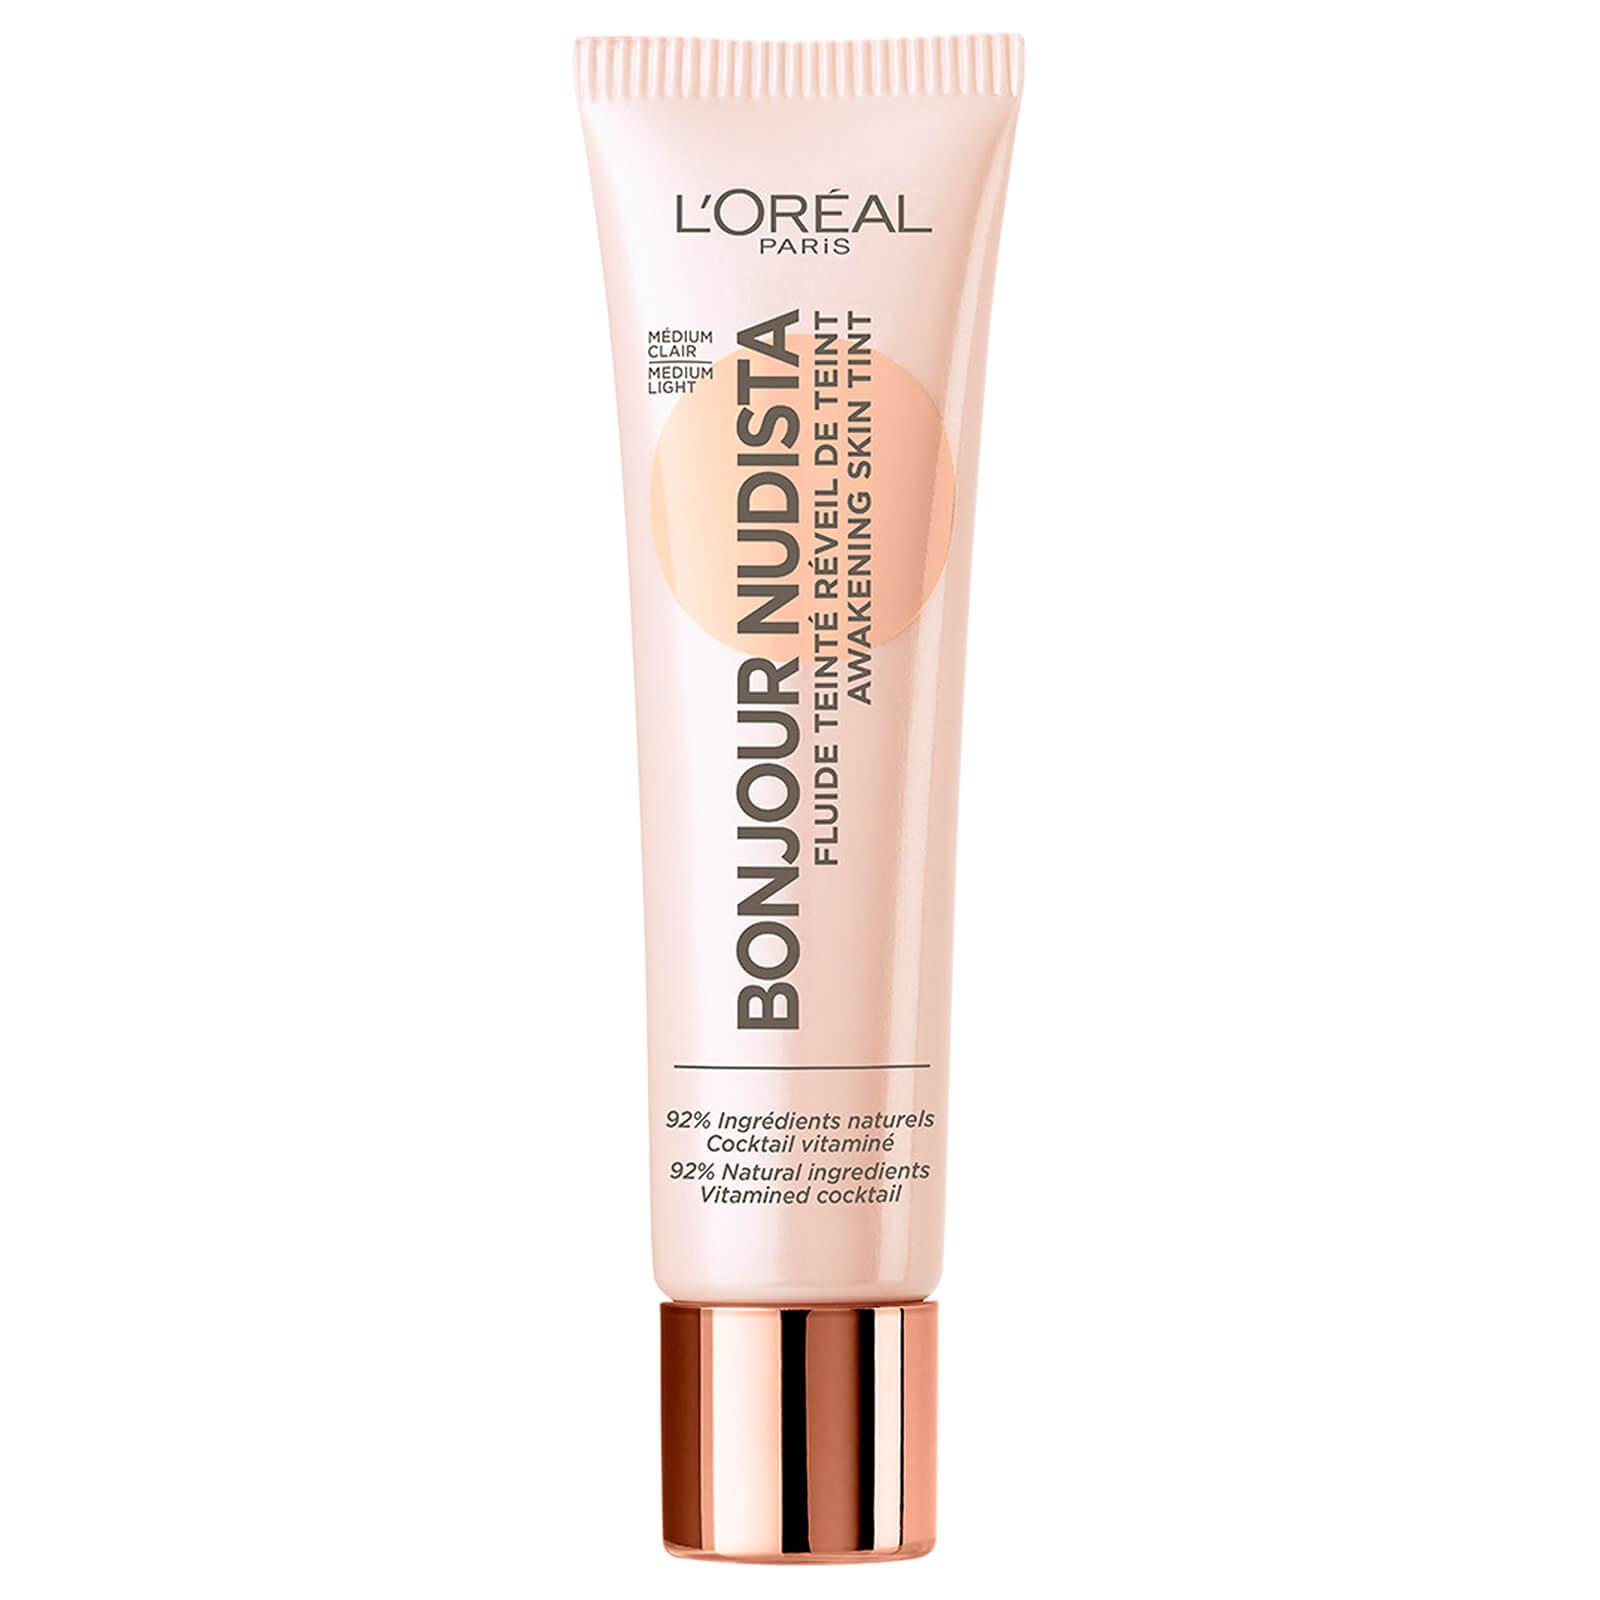 L'Oréal Paris Bonjour Nudista Skin Tint BB Cream 30ml (Various Shades) - Medium Light